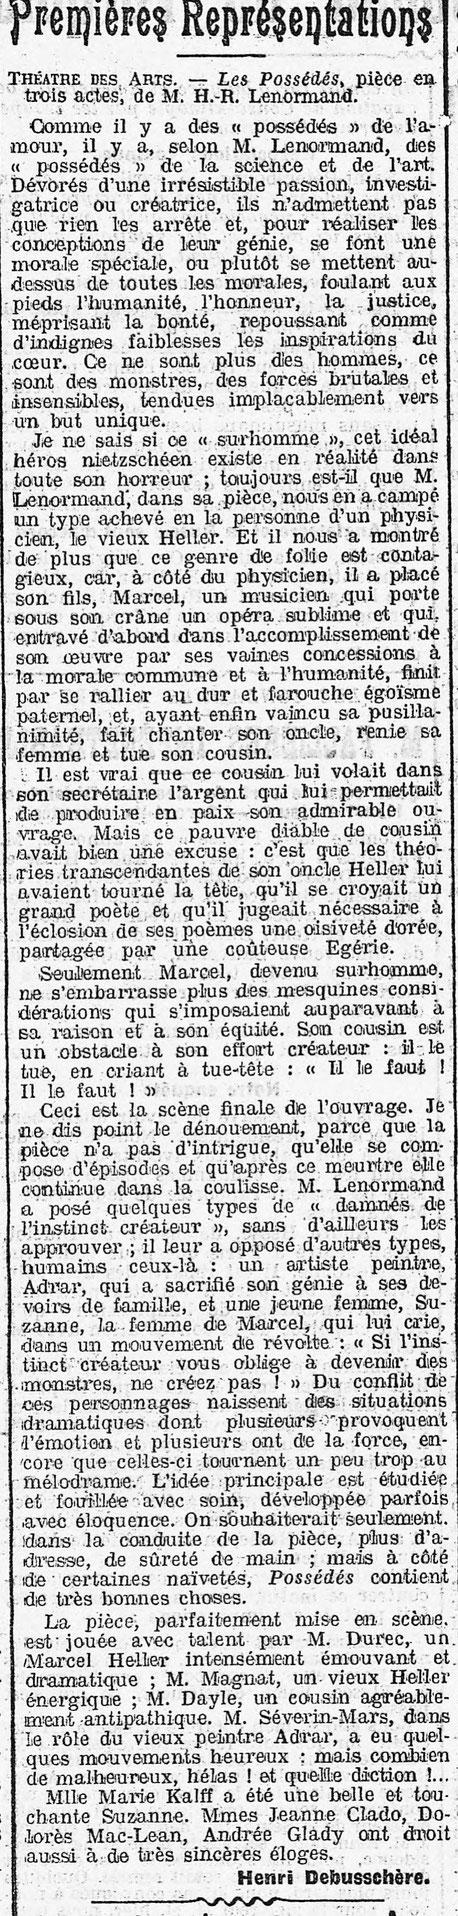 La Presse 16 avril 1909